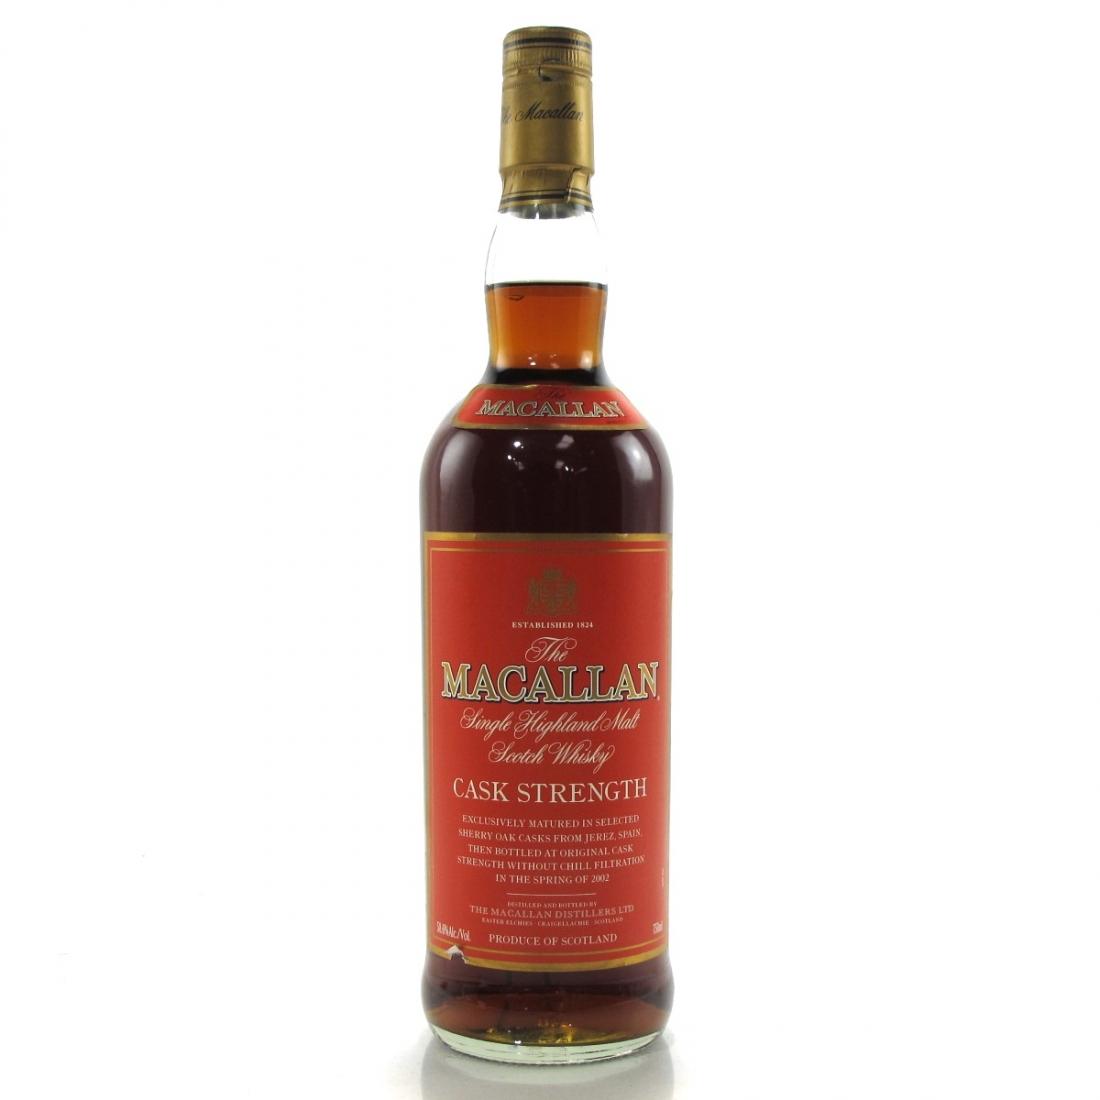 Macallan Cask Strength 58.6% 75cl / US Import